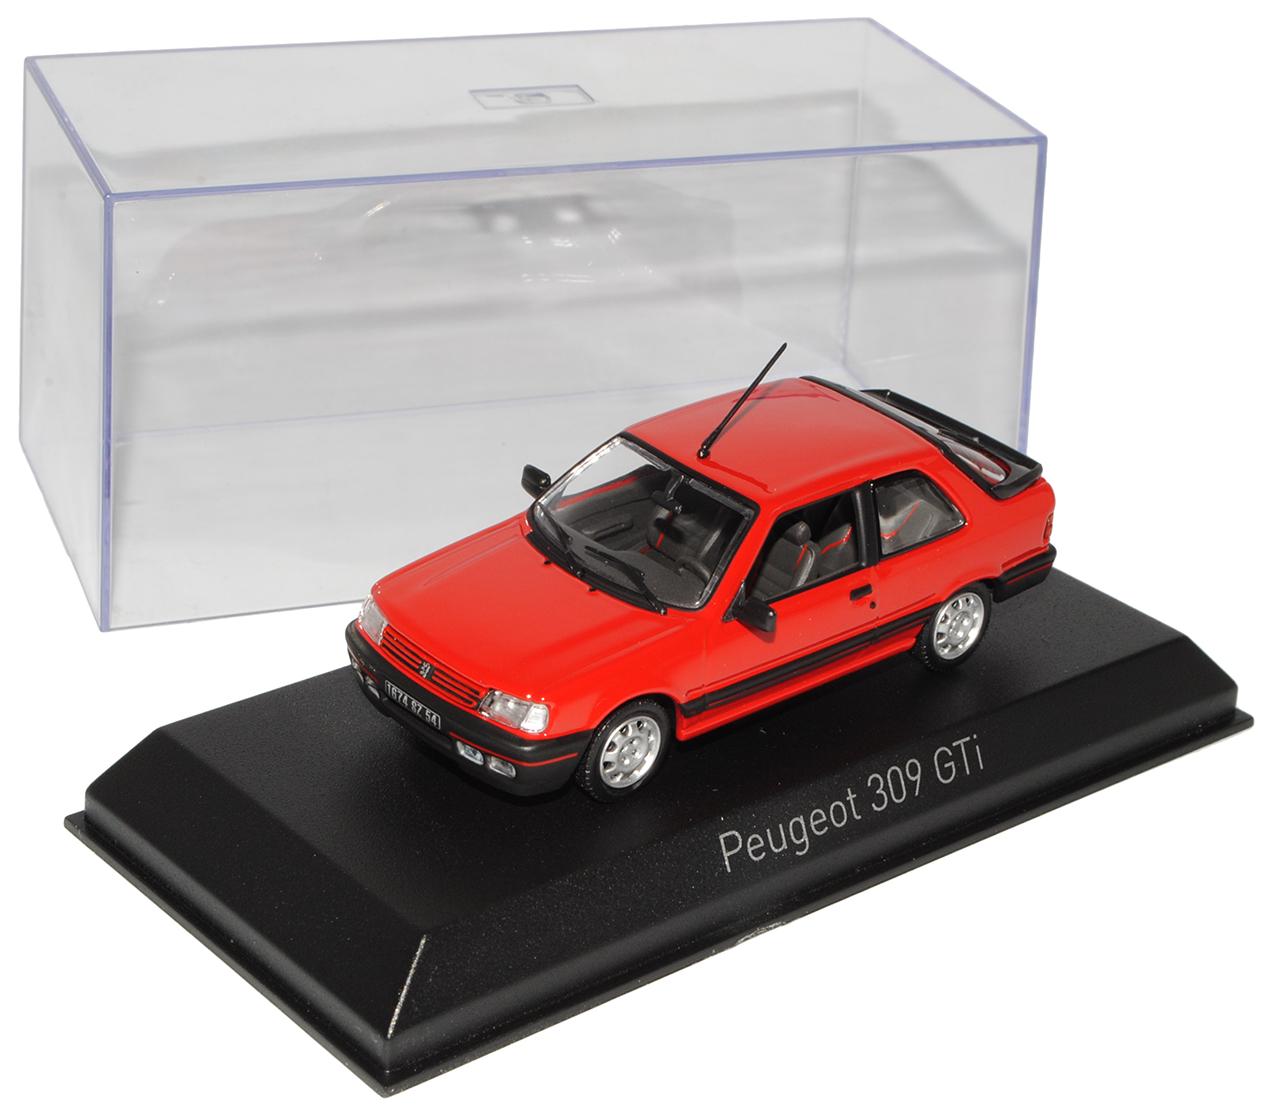 Peugeot 309 GTI red 3 Türer 1985-1993 1 1 1 43 Norev Modell Auto mit oder ohne ind.. d295e5